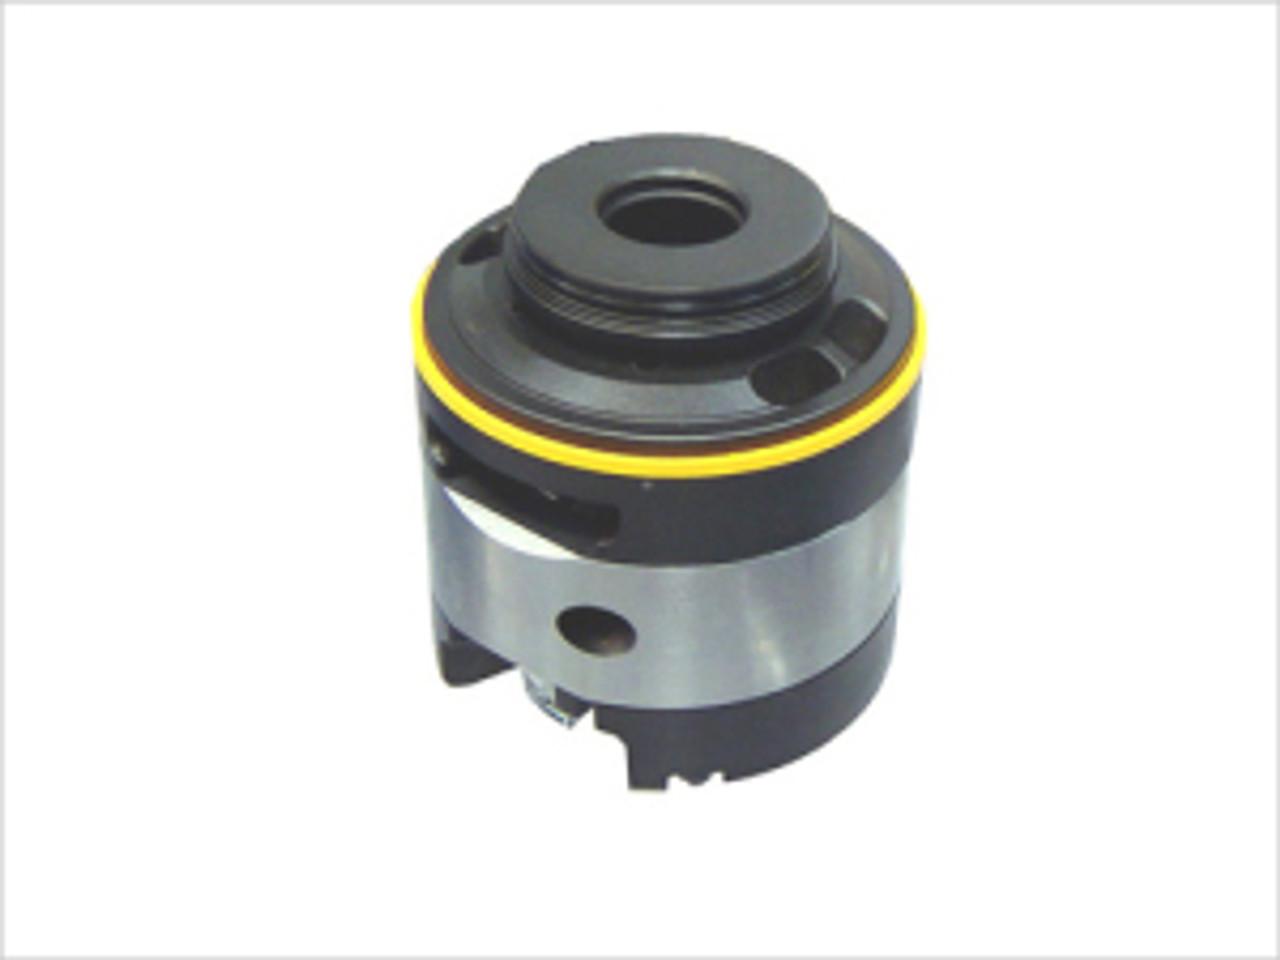 02-137567 Vickers Hydraulic Vane Pump Replacement Cartridge Kit V20 13 GPM Pump